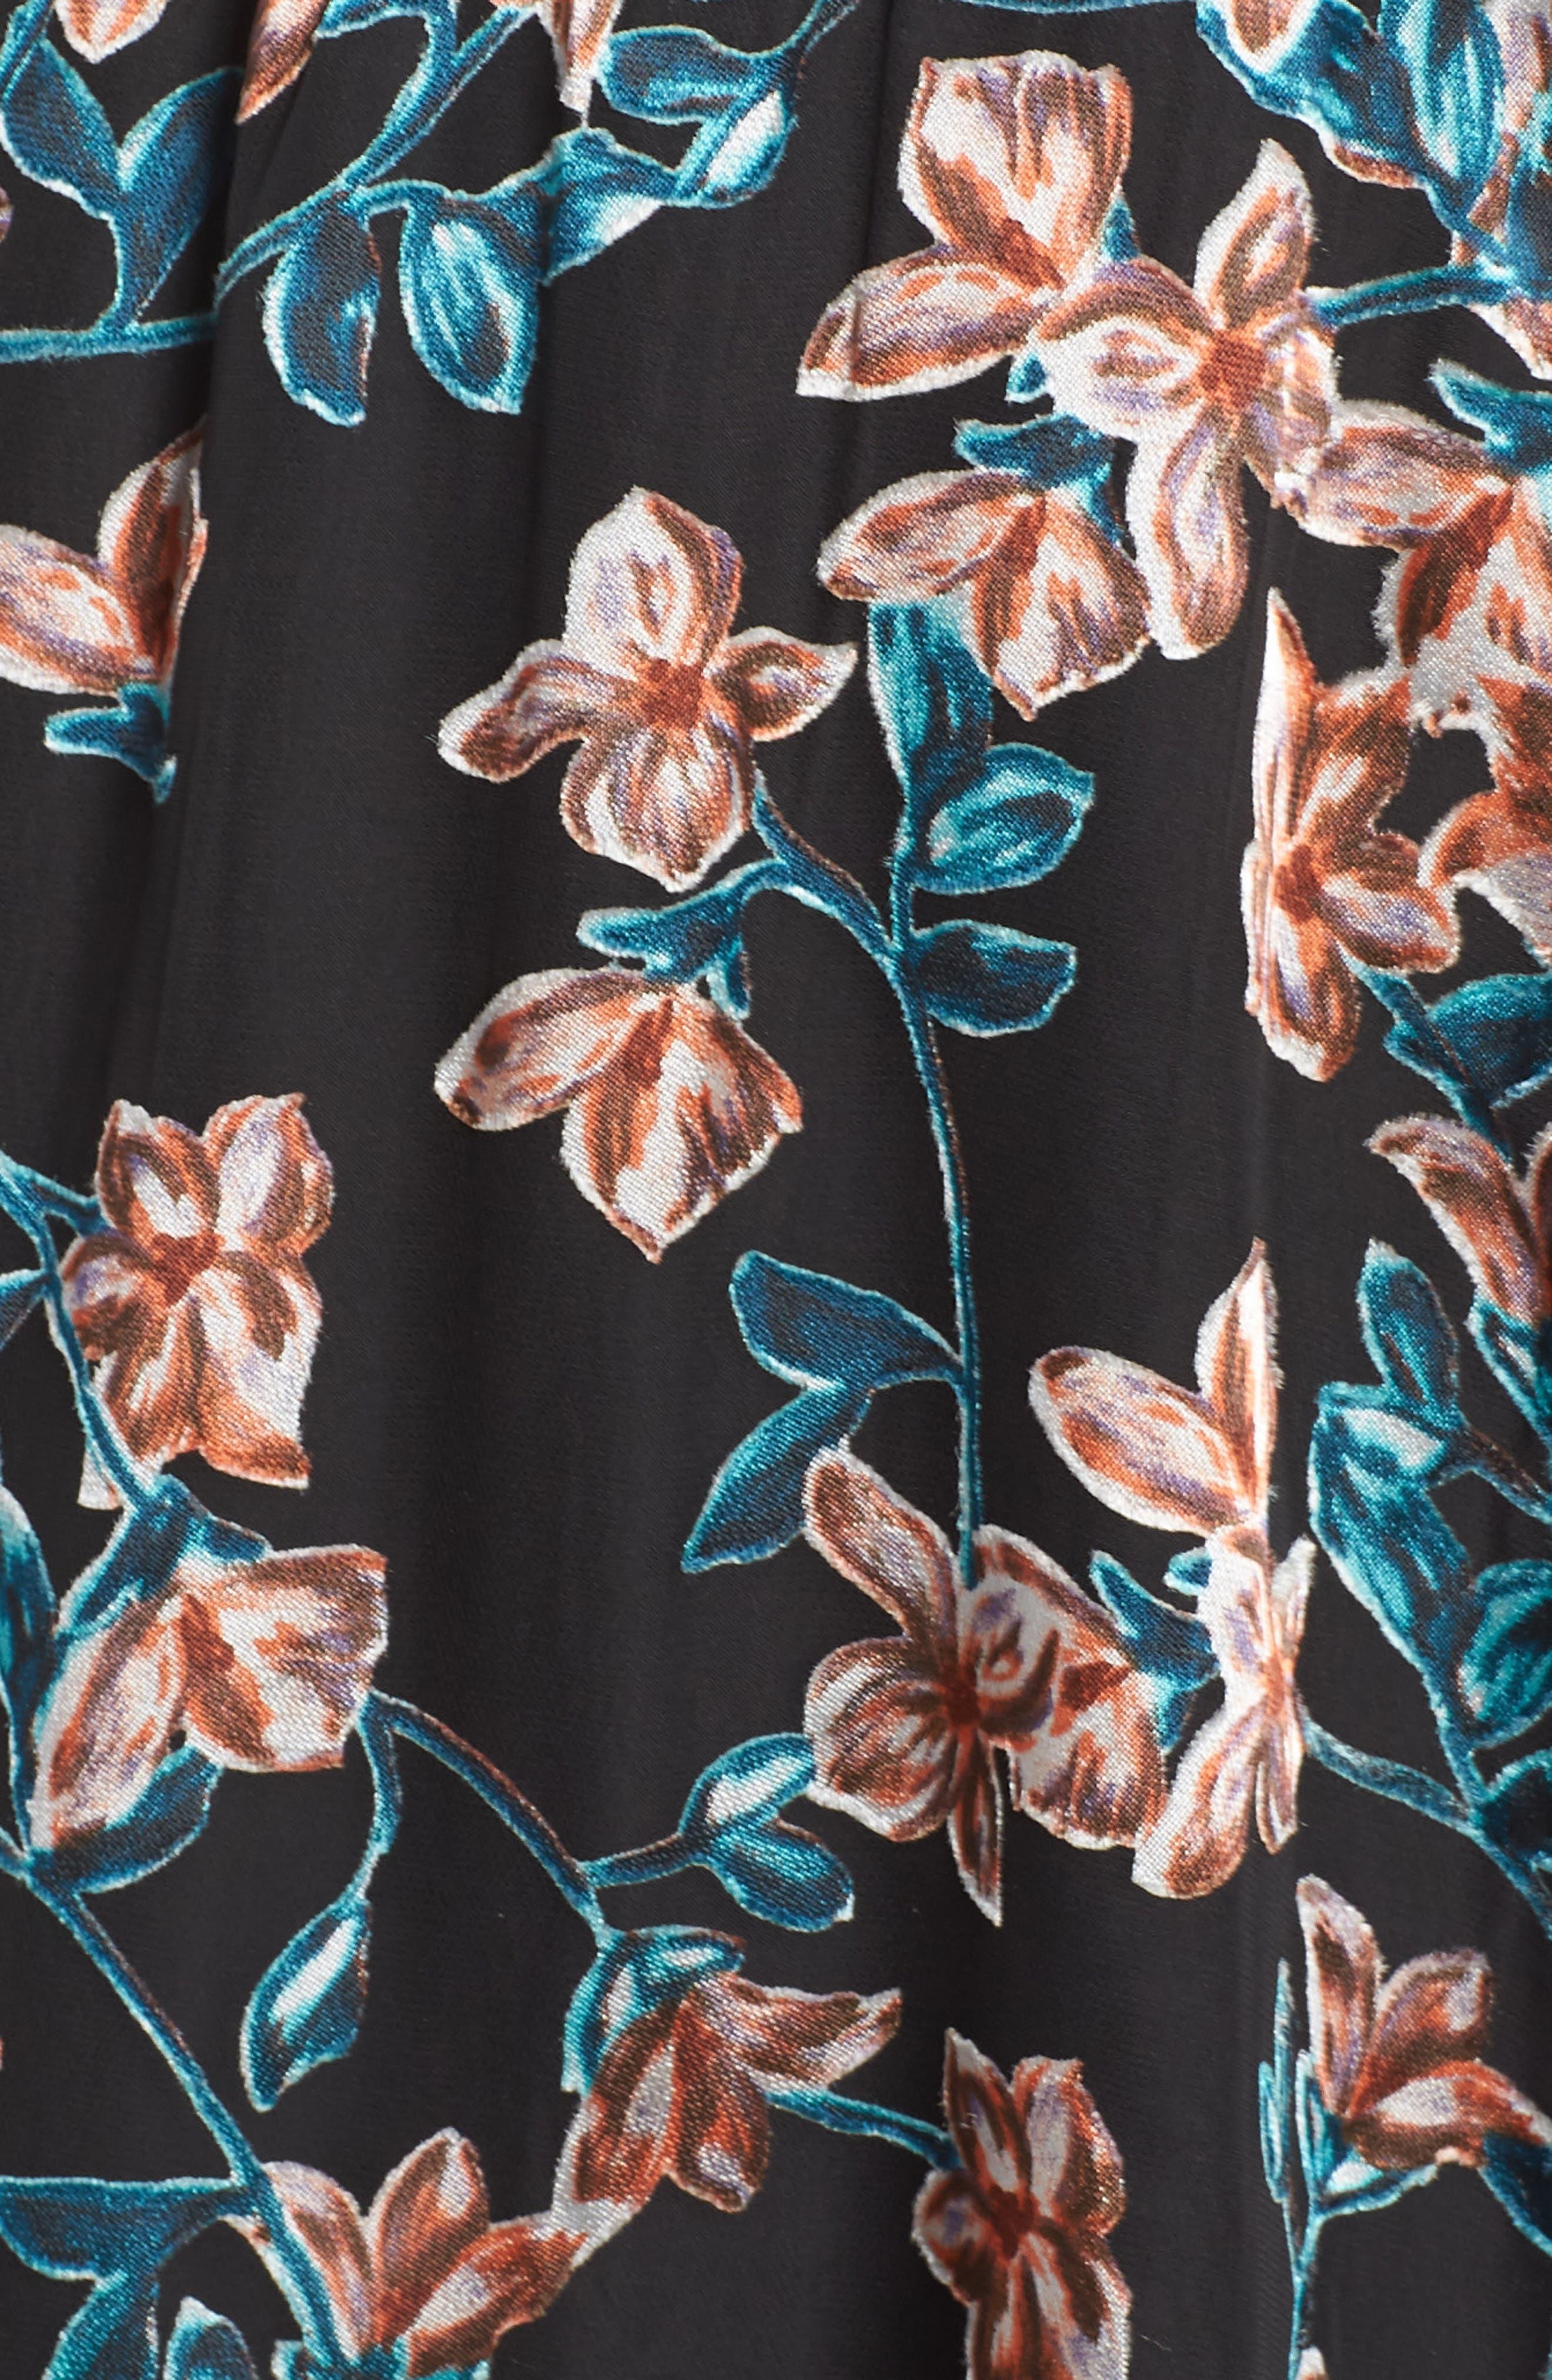 ALI & JAY,                             Treat Me Like a Lady Floral Dress,                             Alternate thumbnail 6, color,                             FLORAL BURNOUT